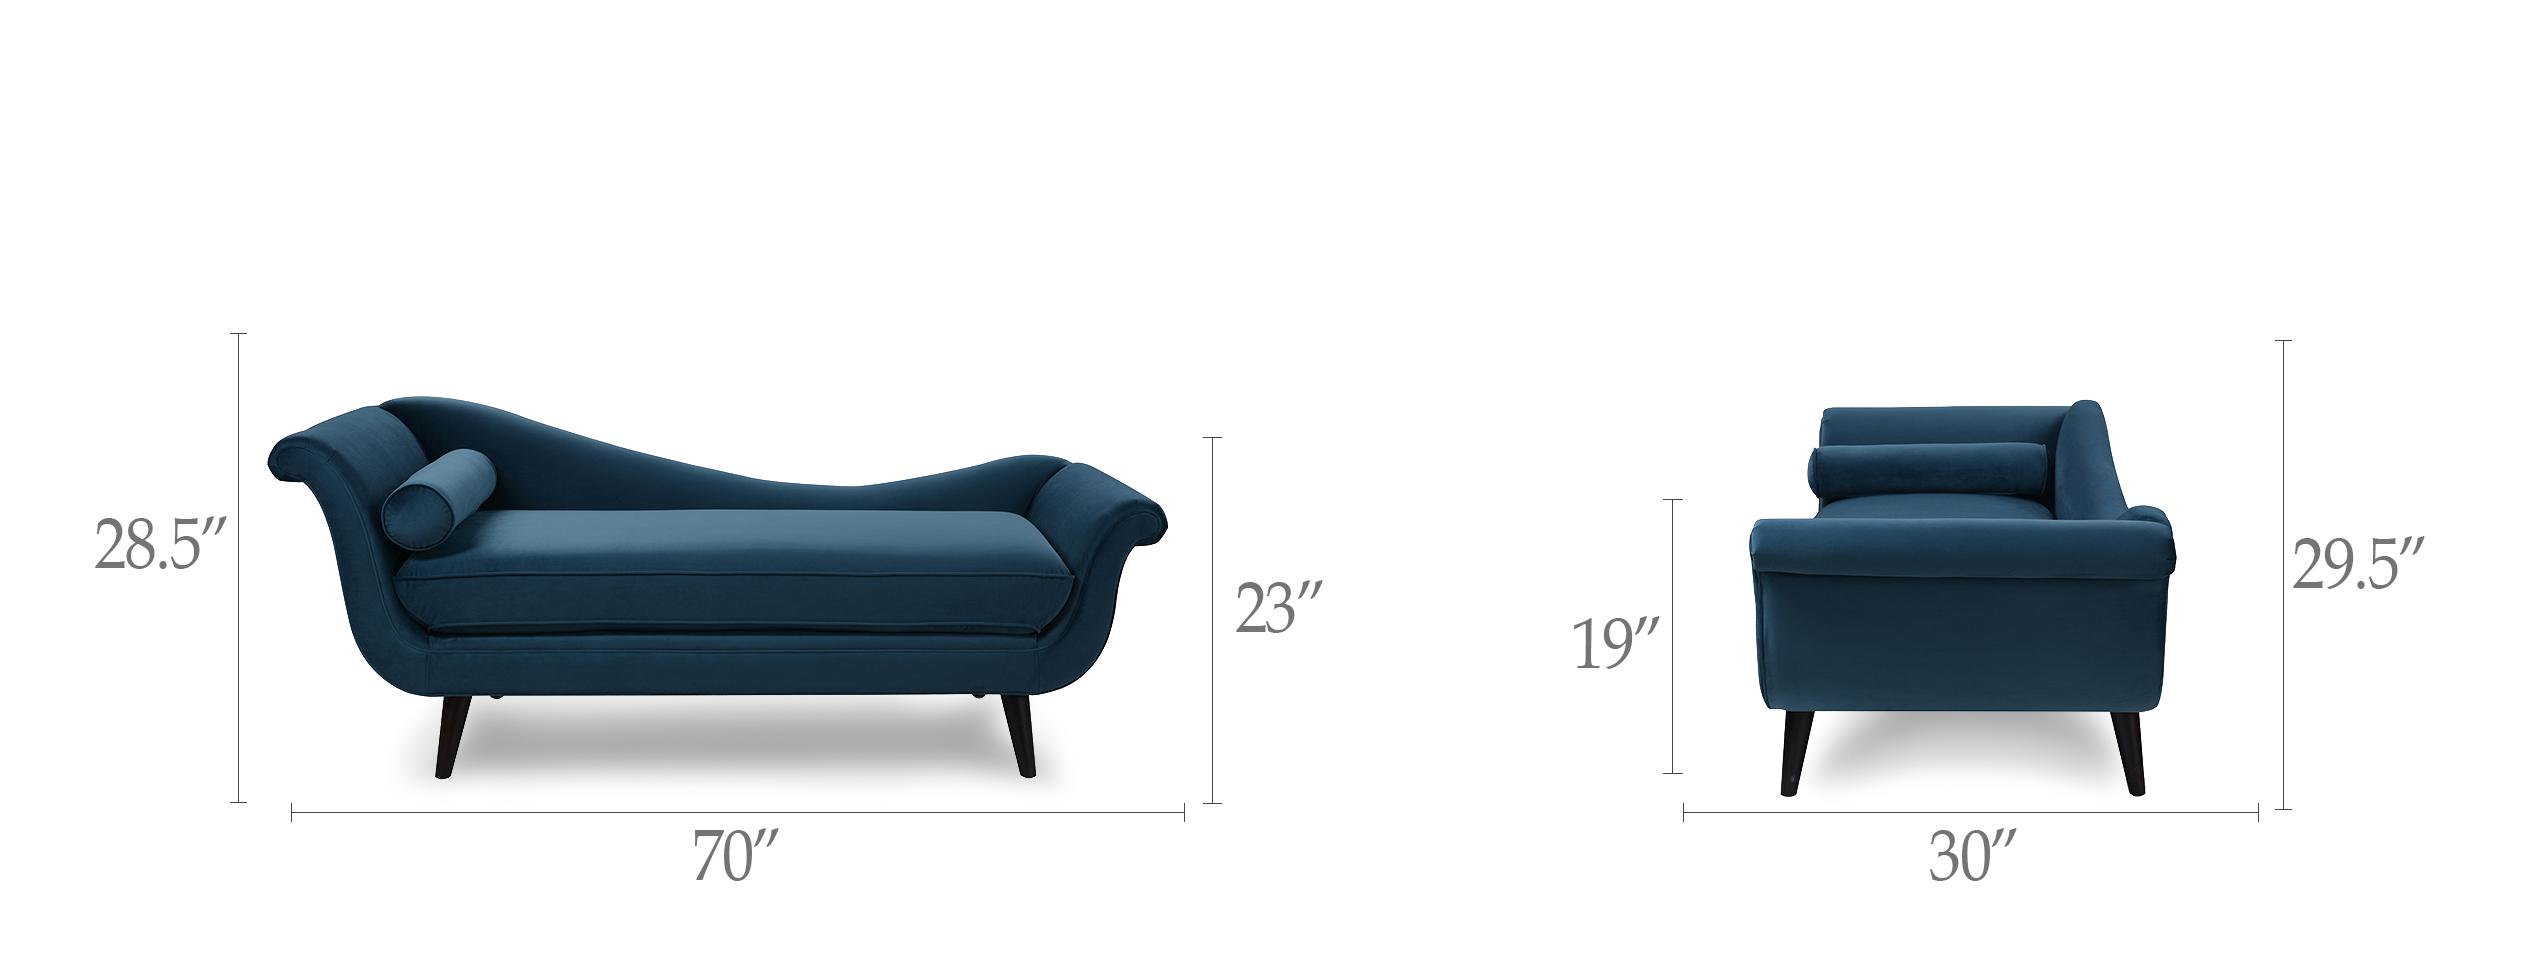 Surprising Kai Chaise Lounge Spiritservingveterans Wood Chair Design Ideas Spiritservingveteransorg